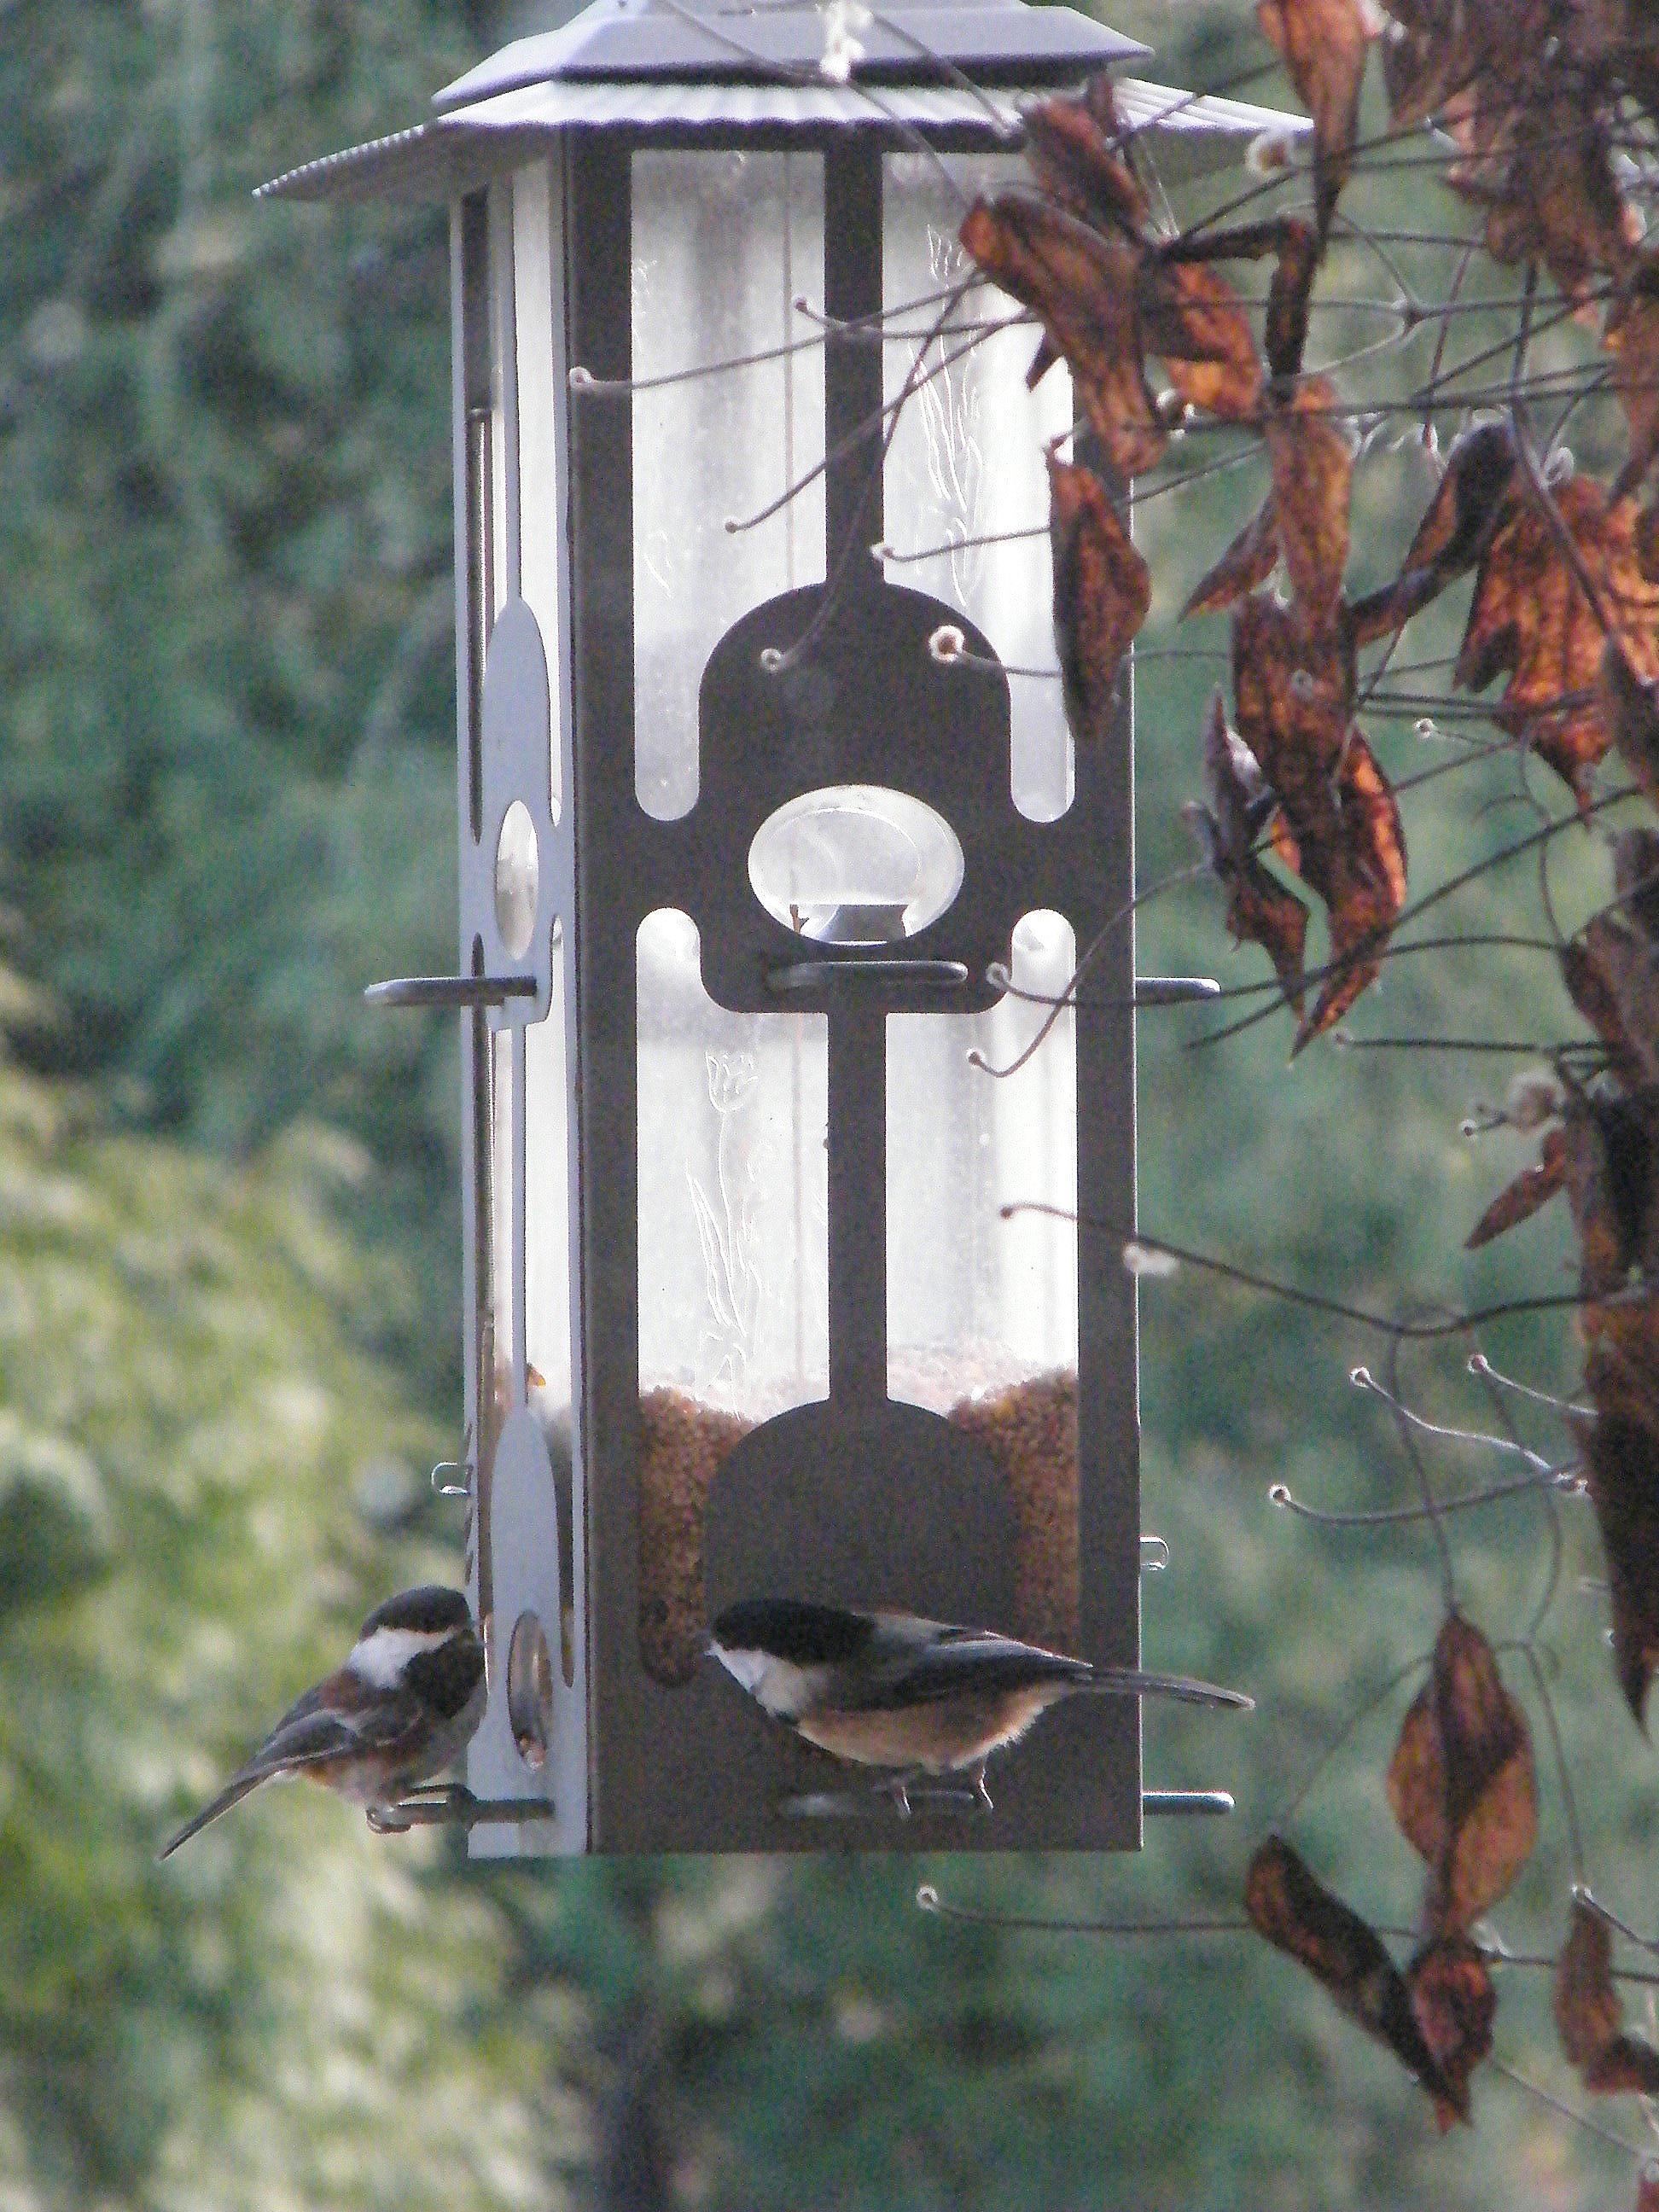 Birds at the feeder.